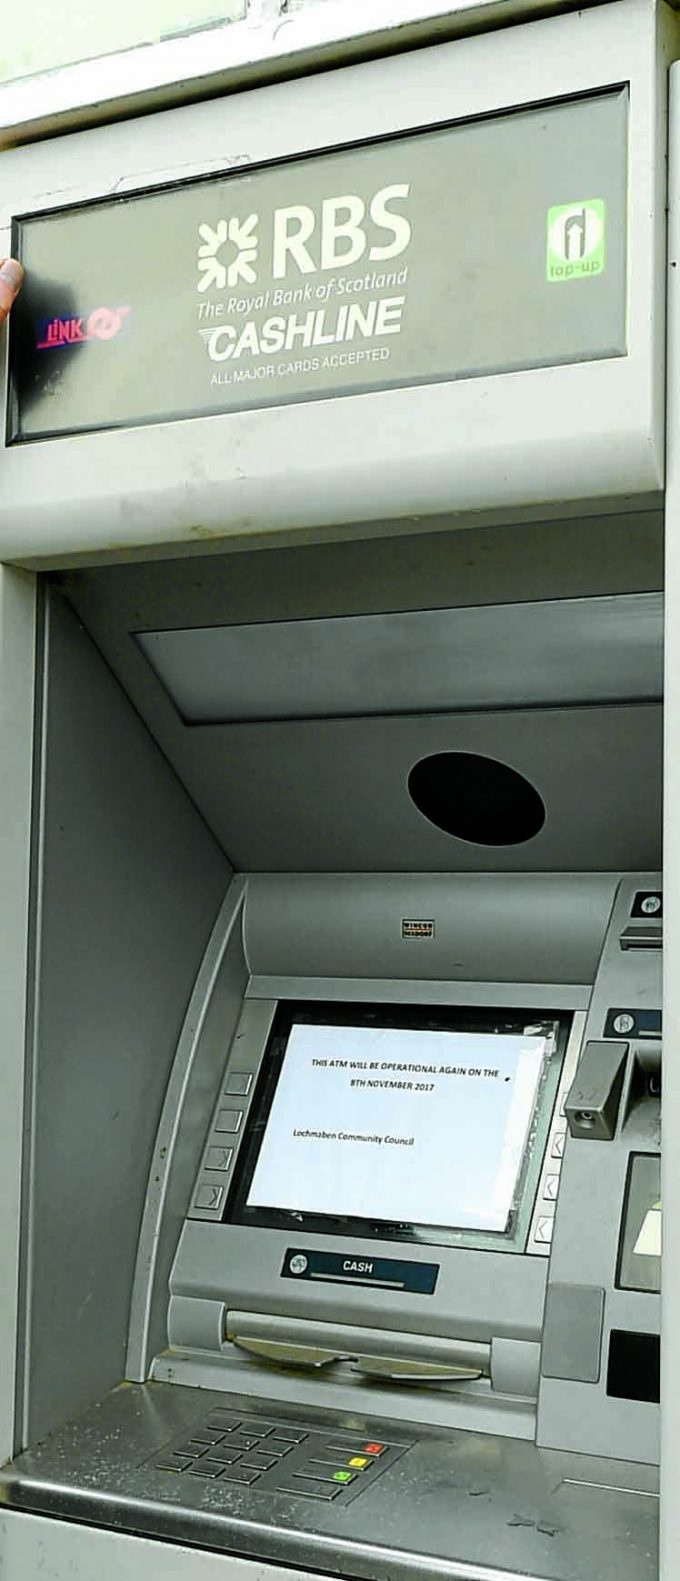 Apologies for covid cash machine failings